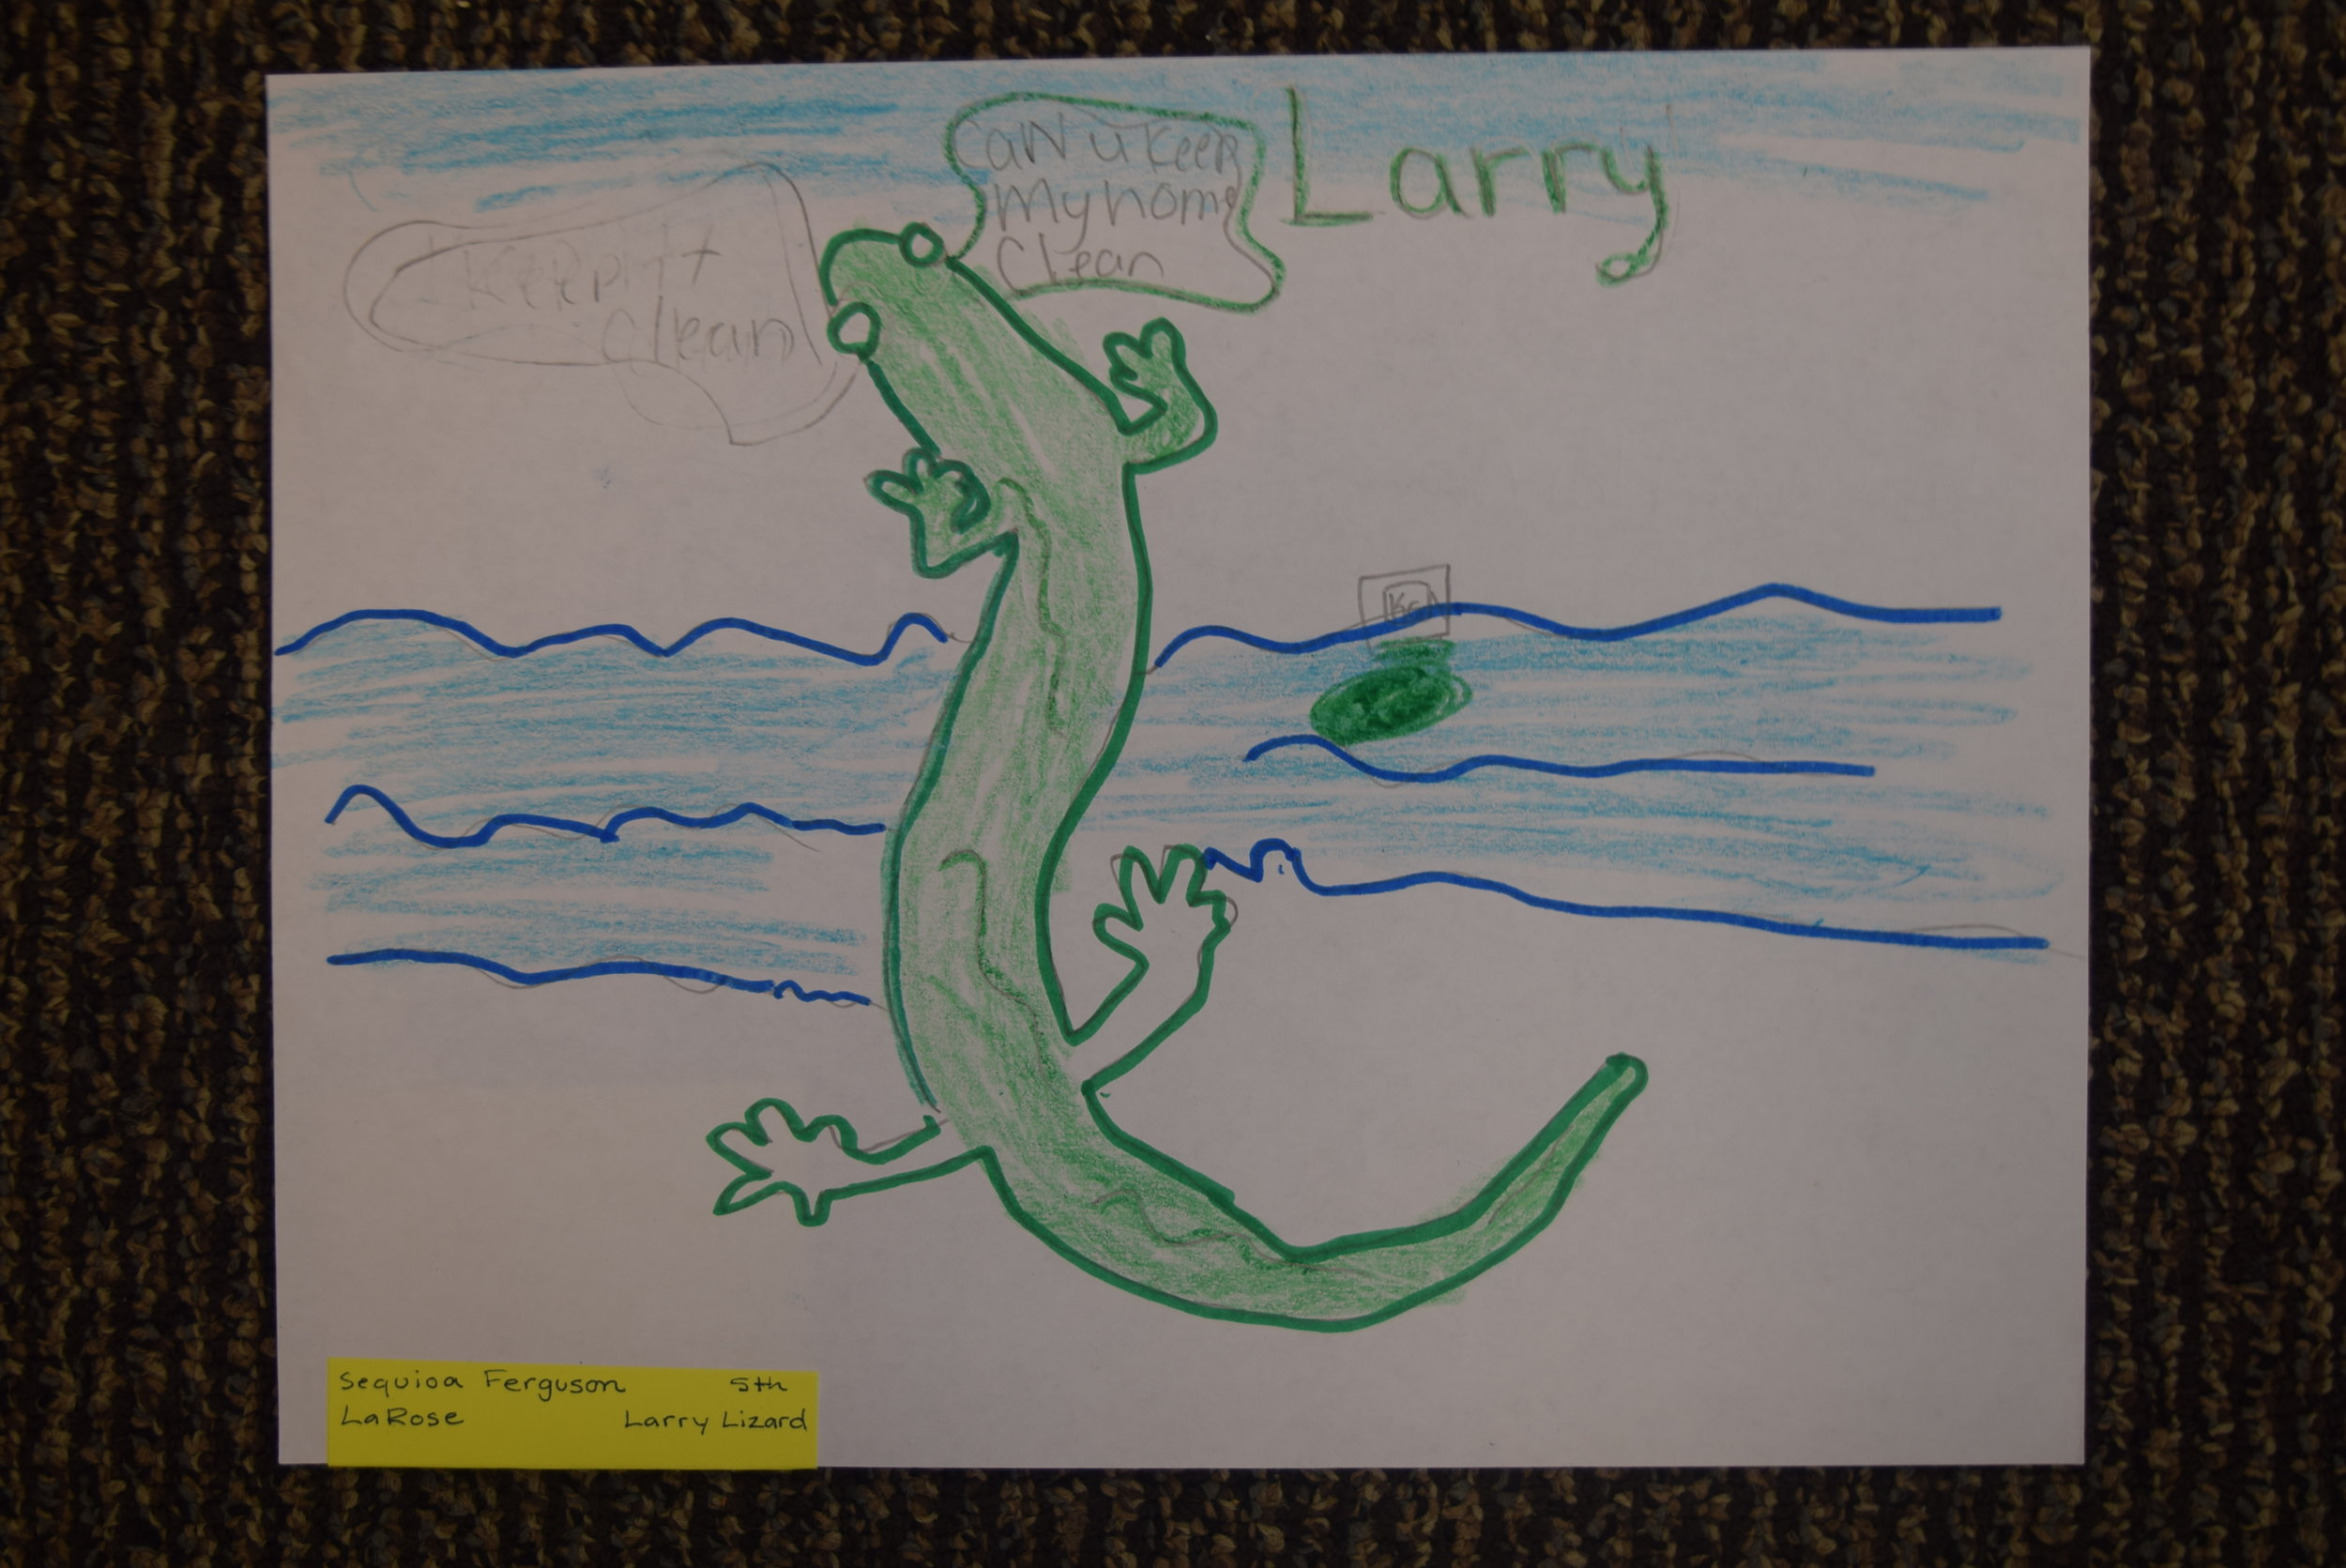 Sequioa Ferguson- LaRose, 5th grade